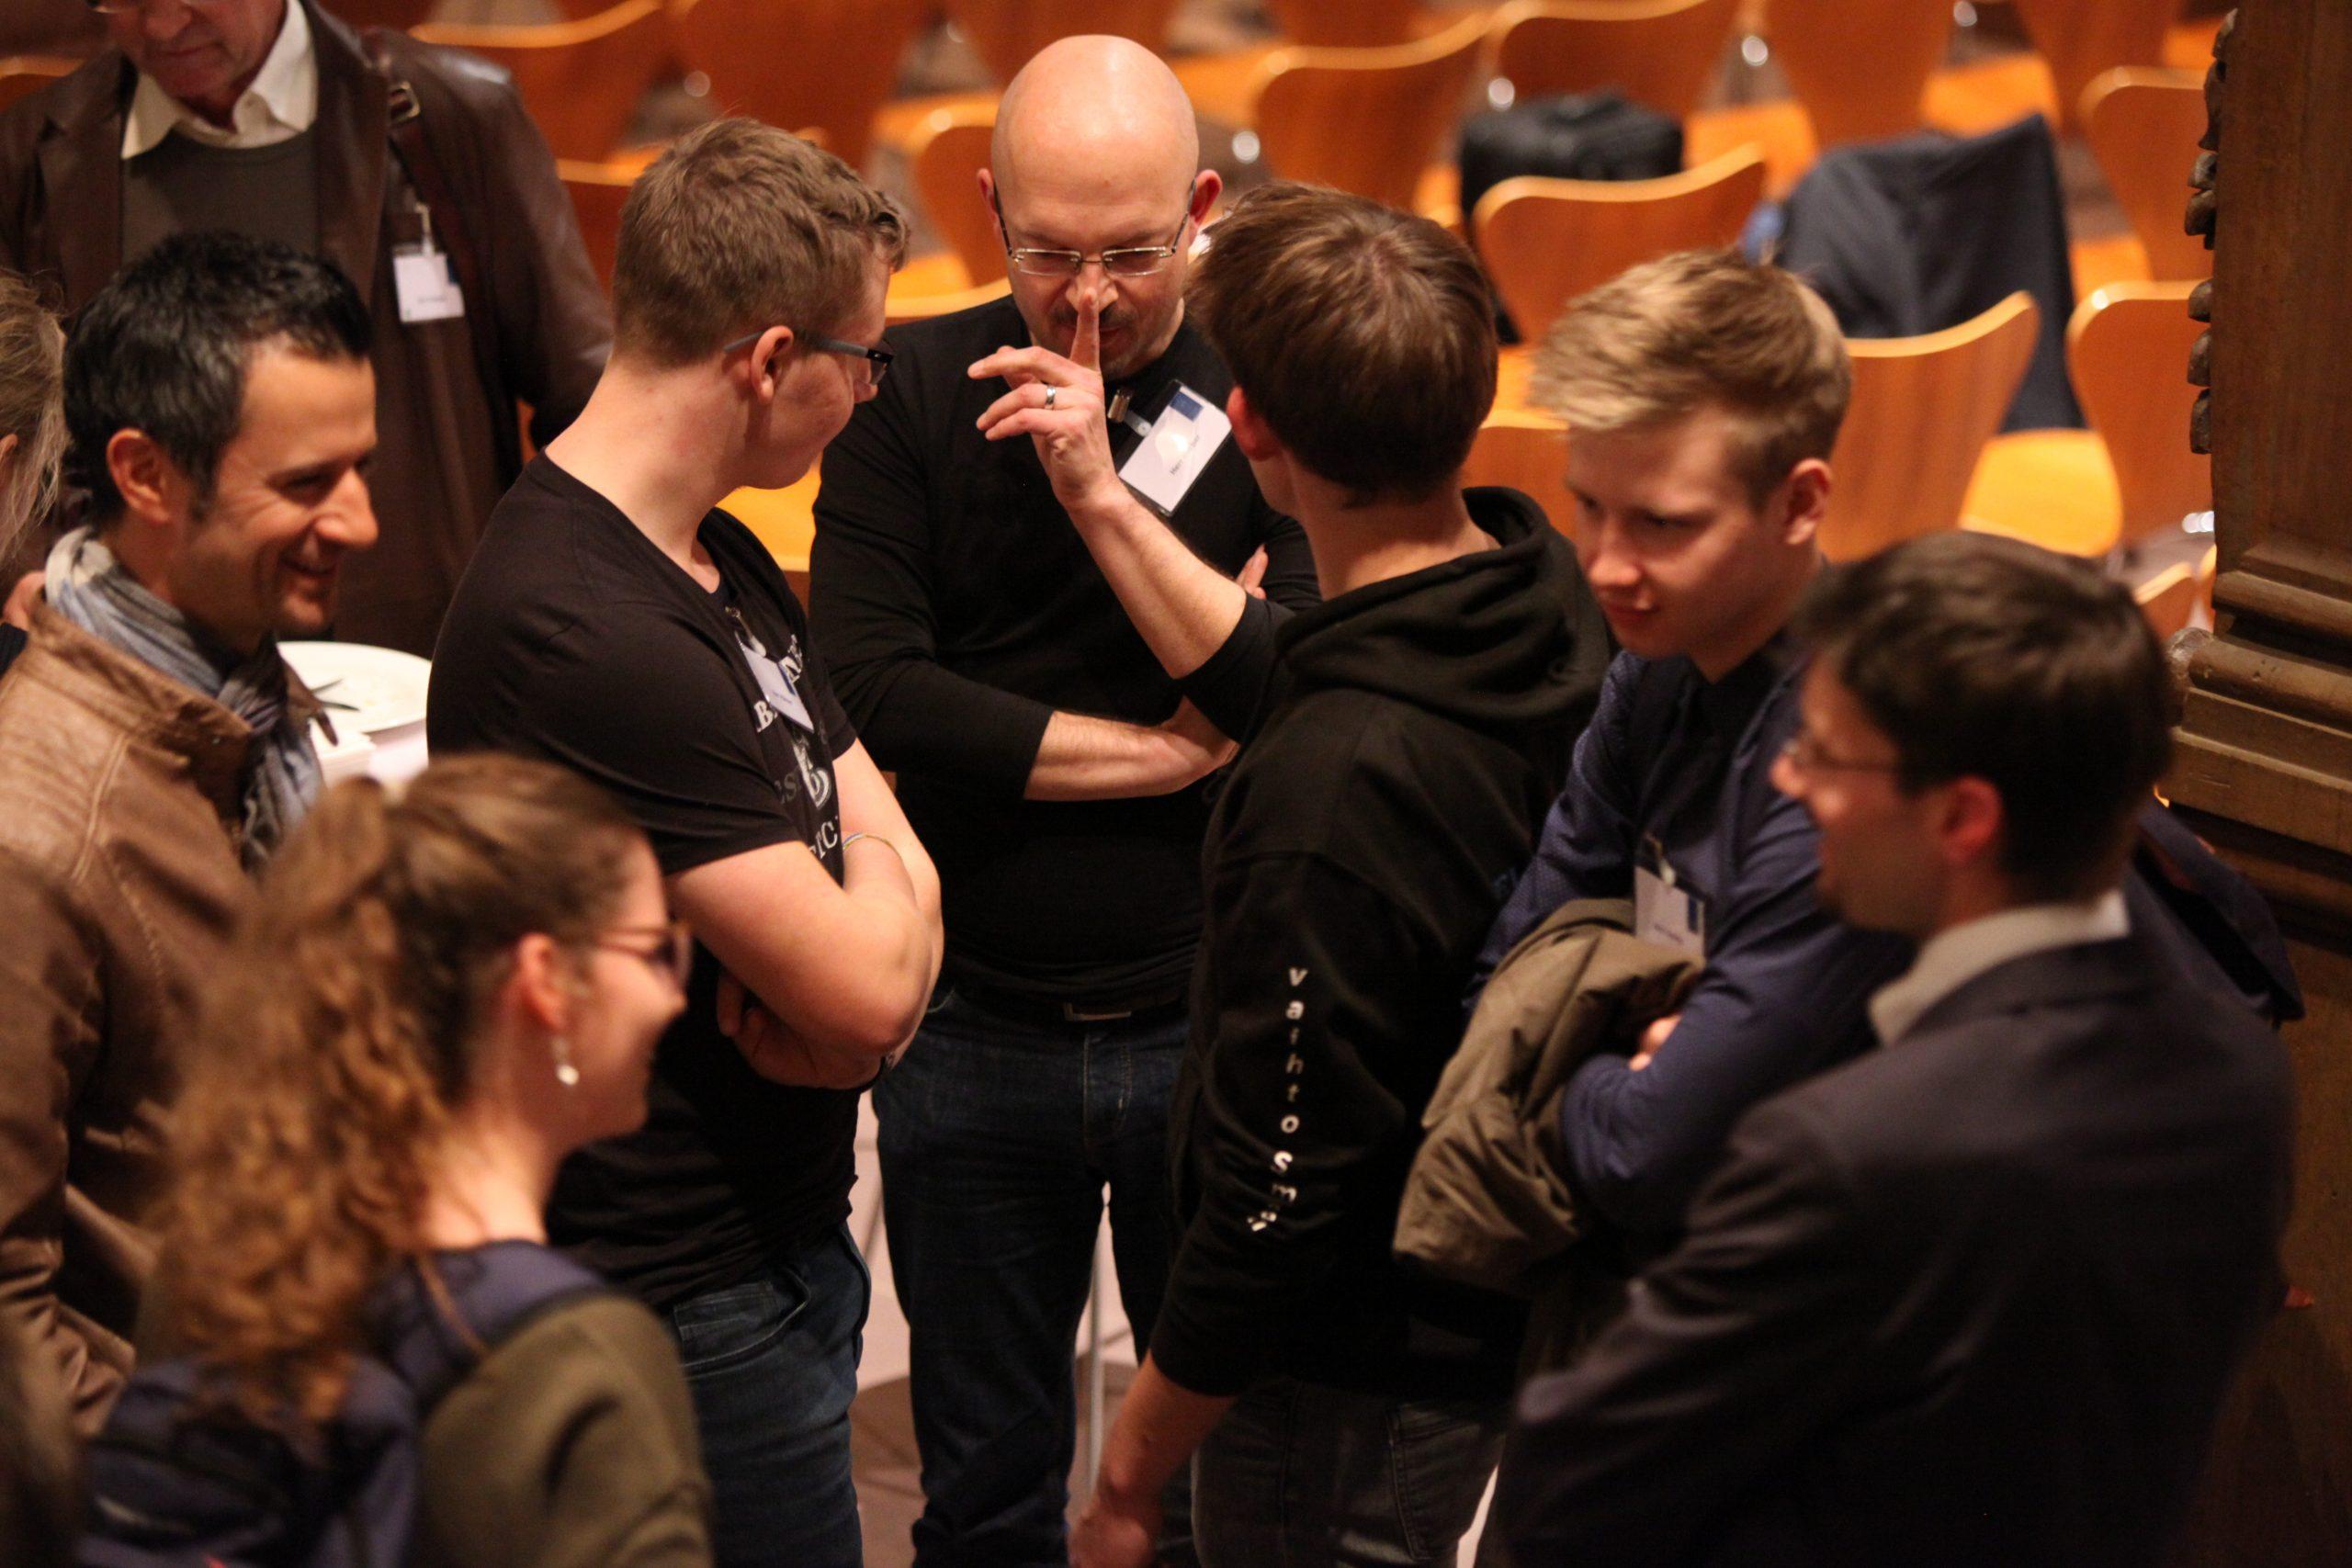 Interessante Gespräche im Anschluss. Foto: Pressebüro Stefan Pfister/Schweinfurt